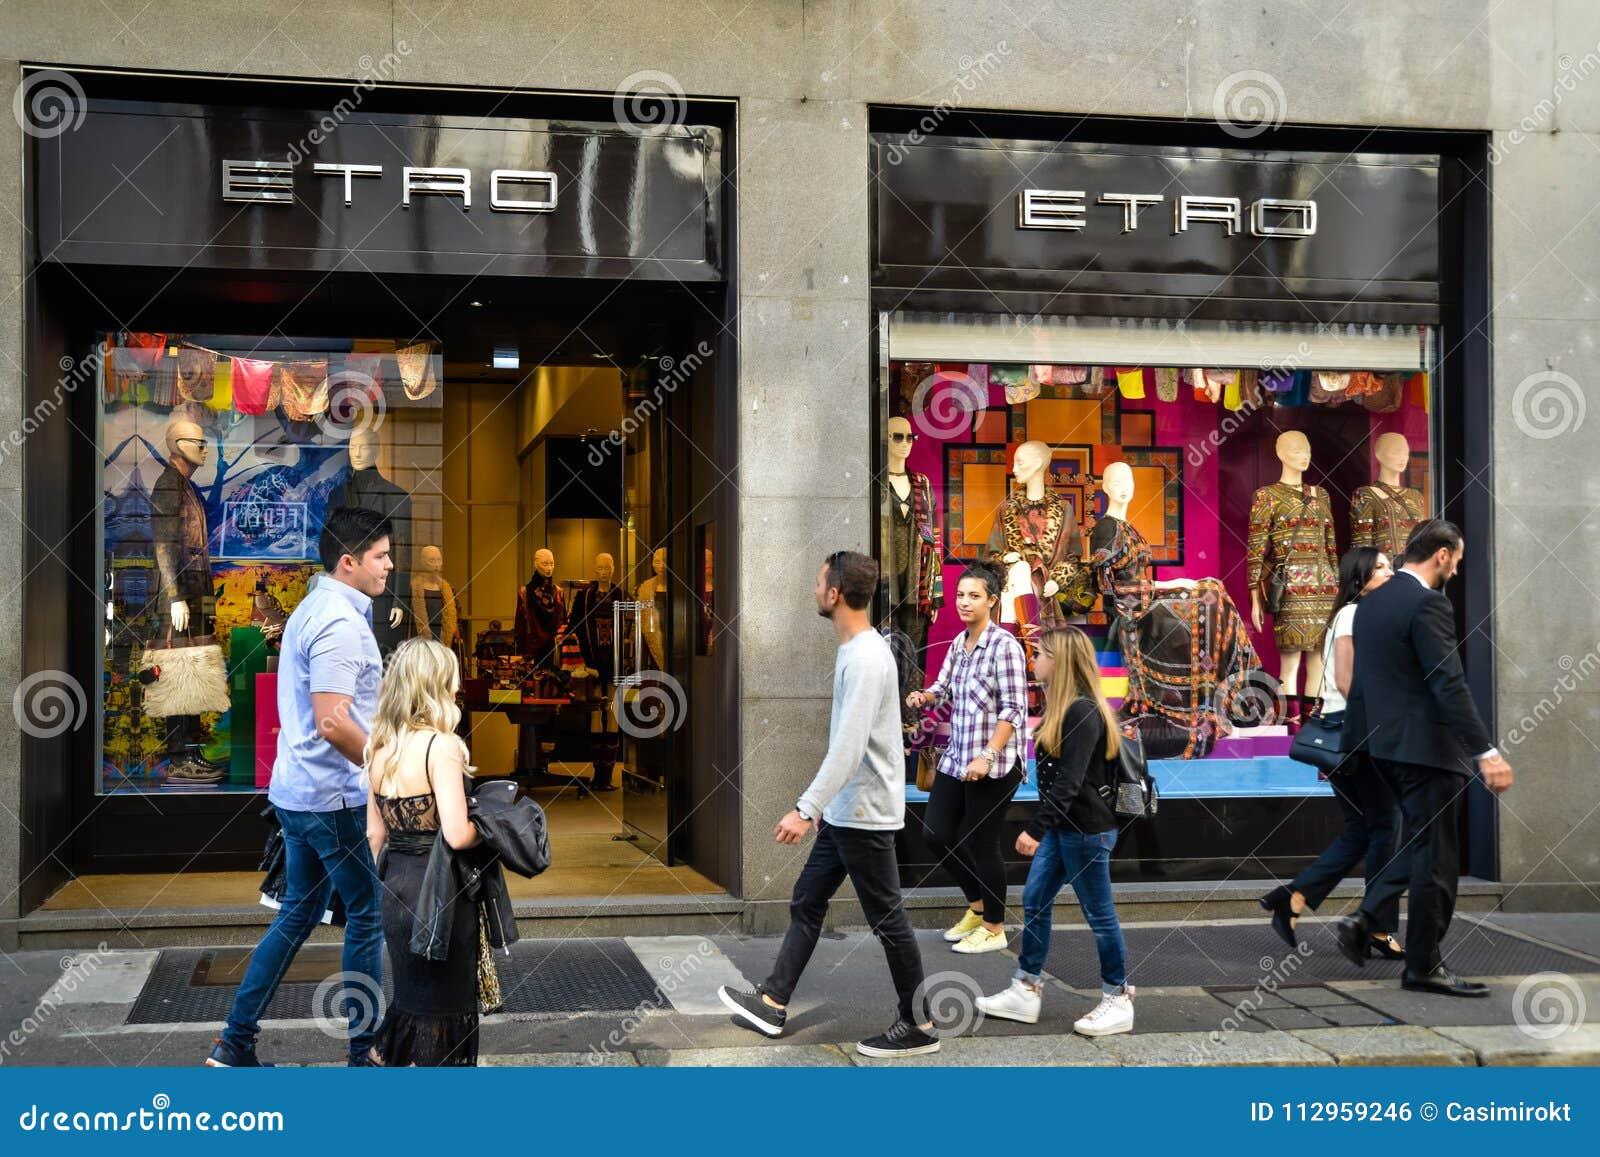 finest selection e1350 ce8b5 Milan, Italy - September 24, 2017: Etro Store In Milan ...